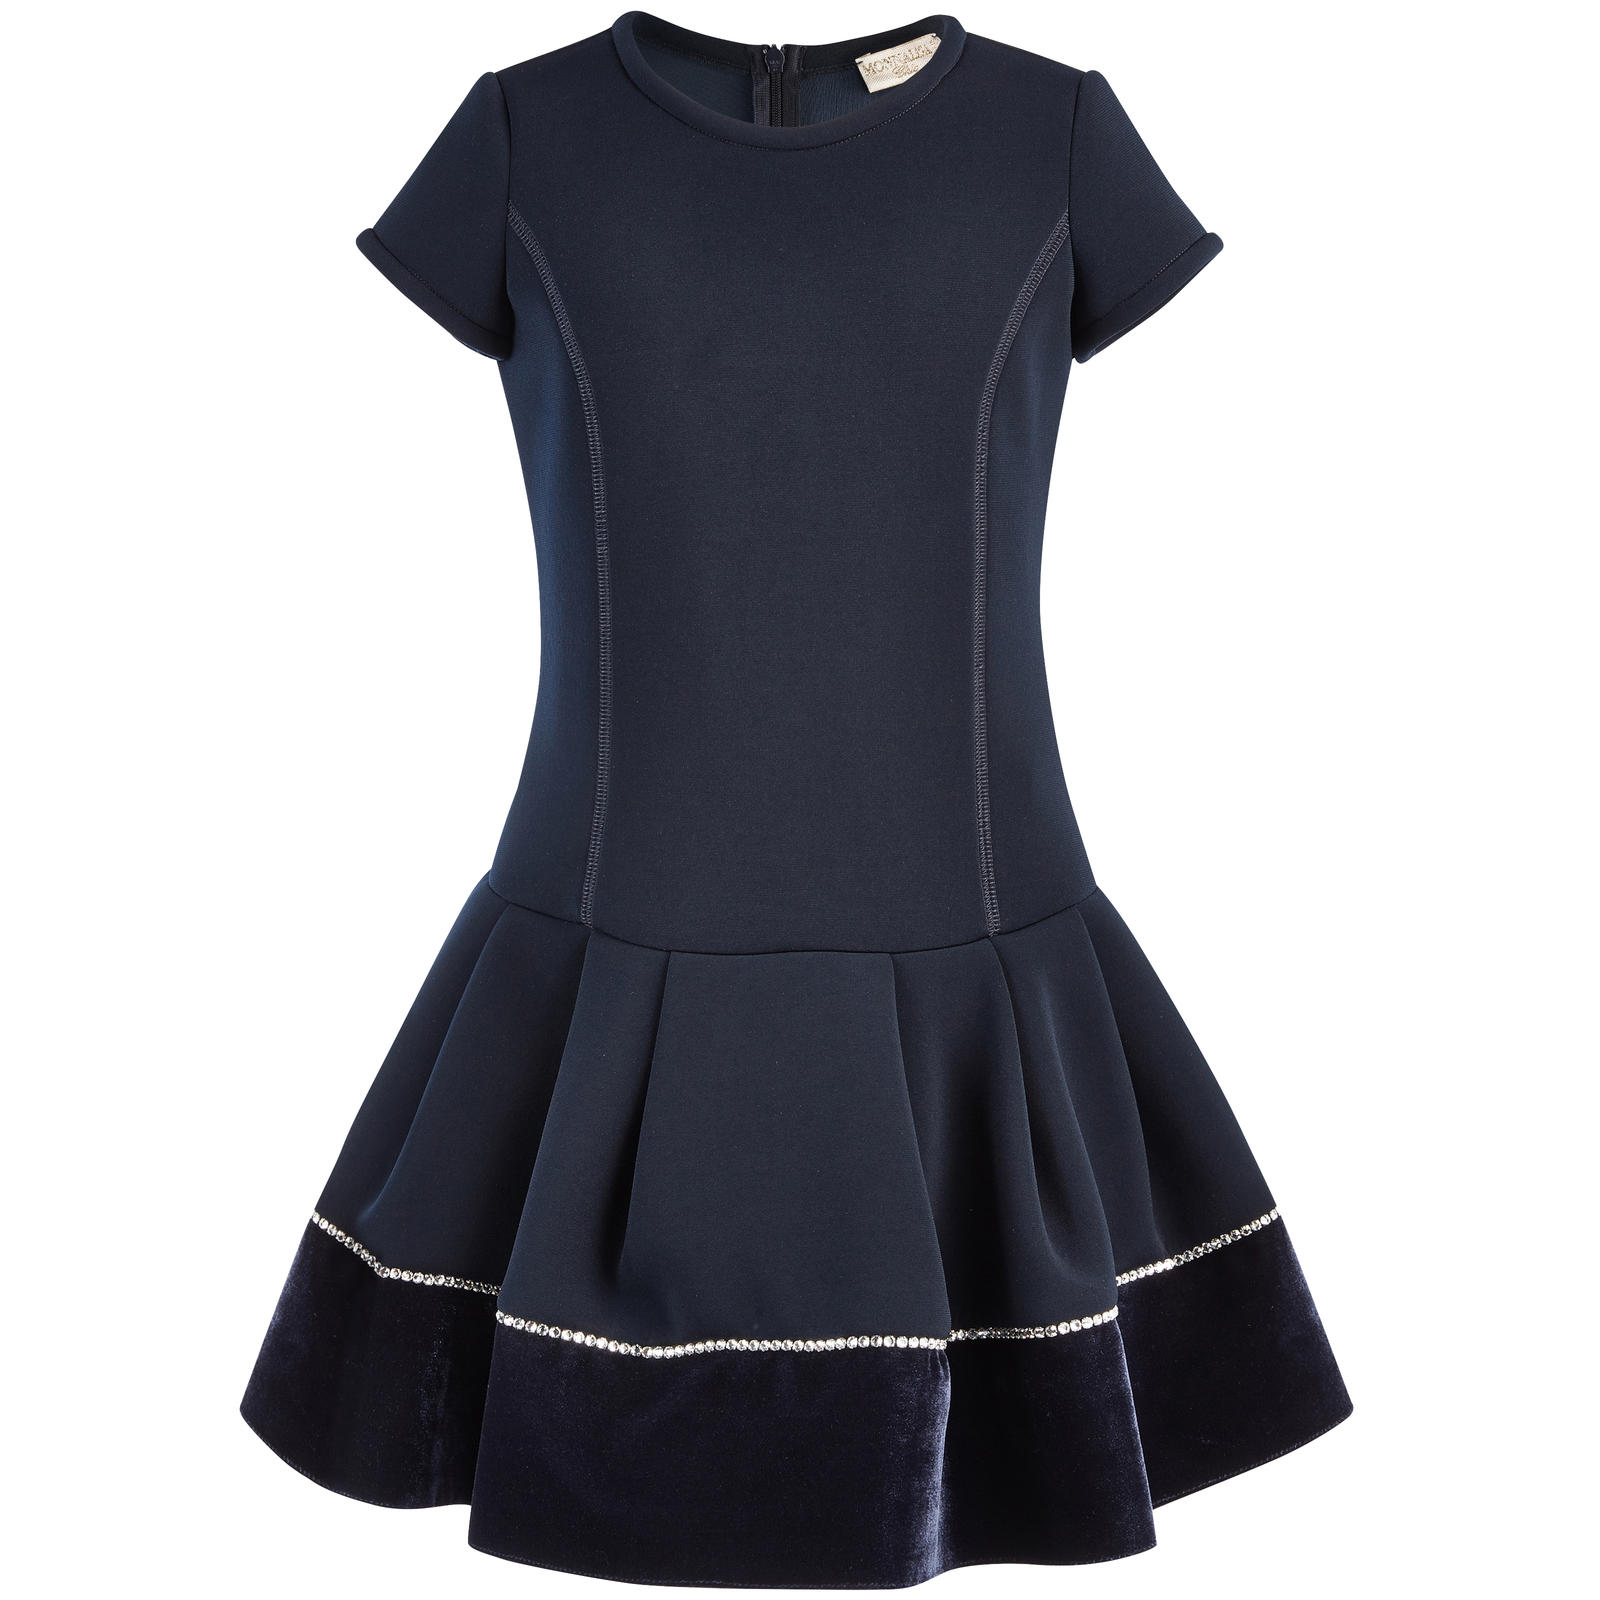 The Best Sites For Girls Tween Holiday Party Dresses – Girls Tween ...